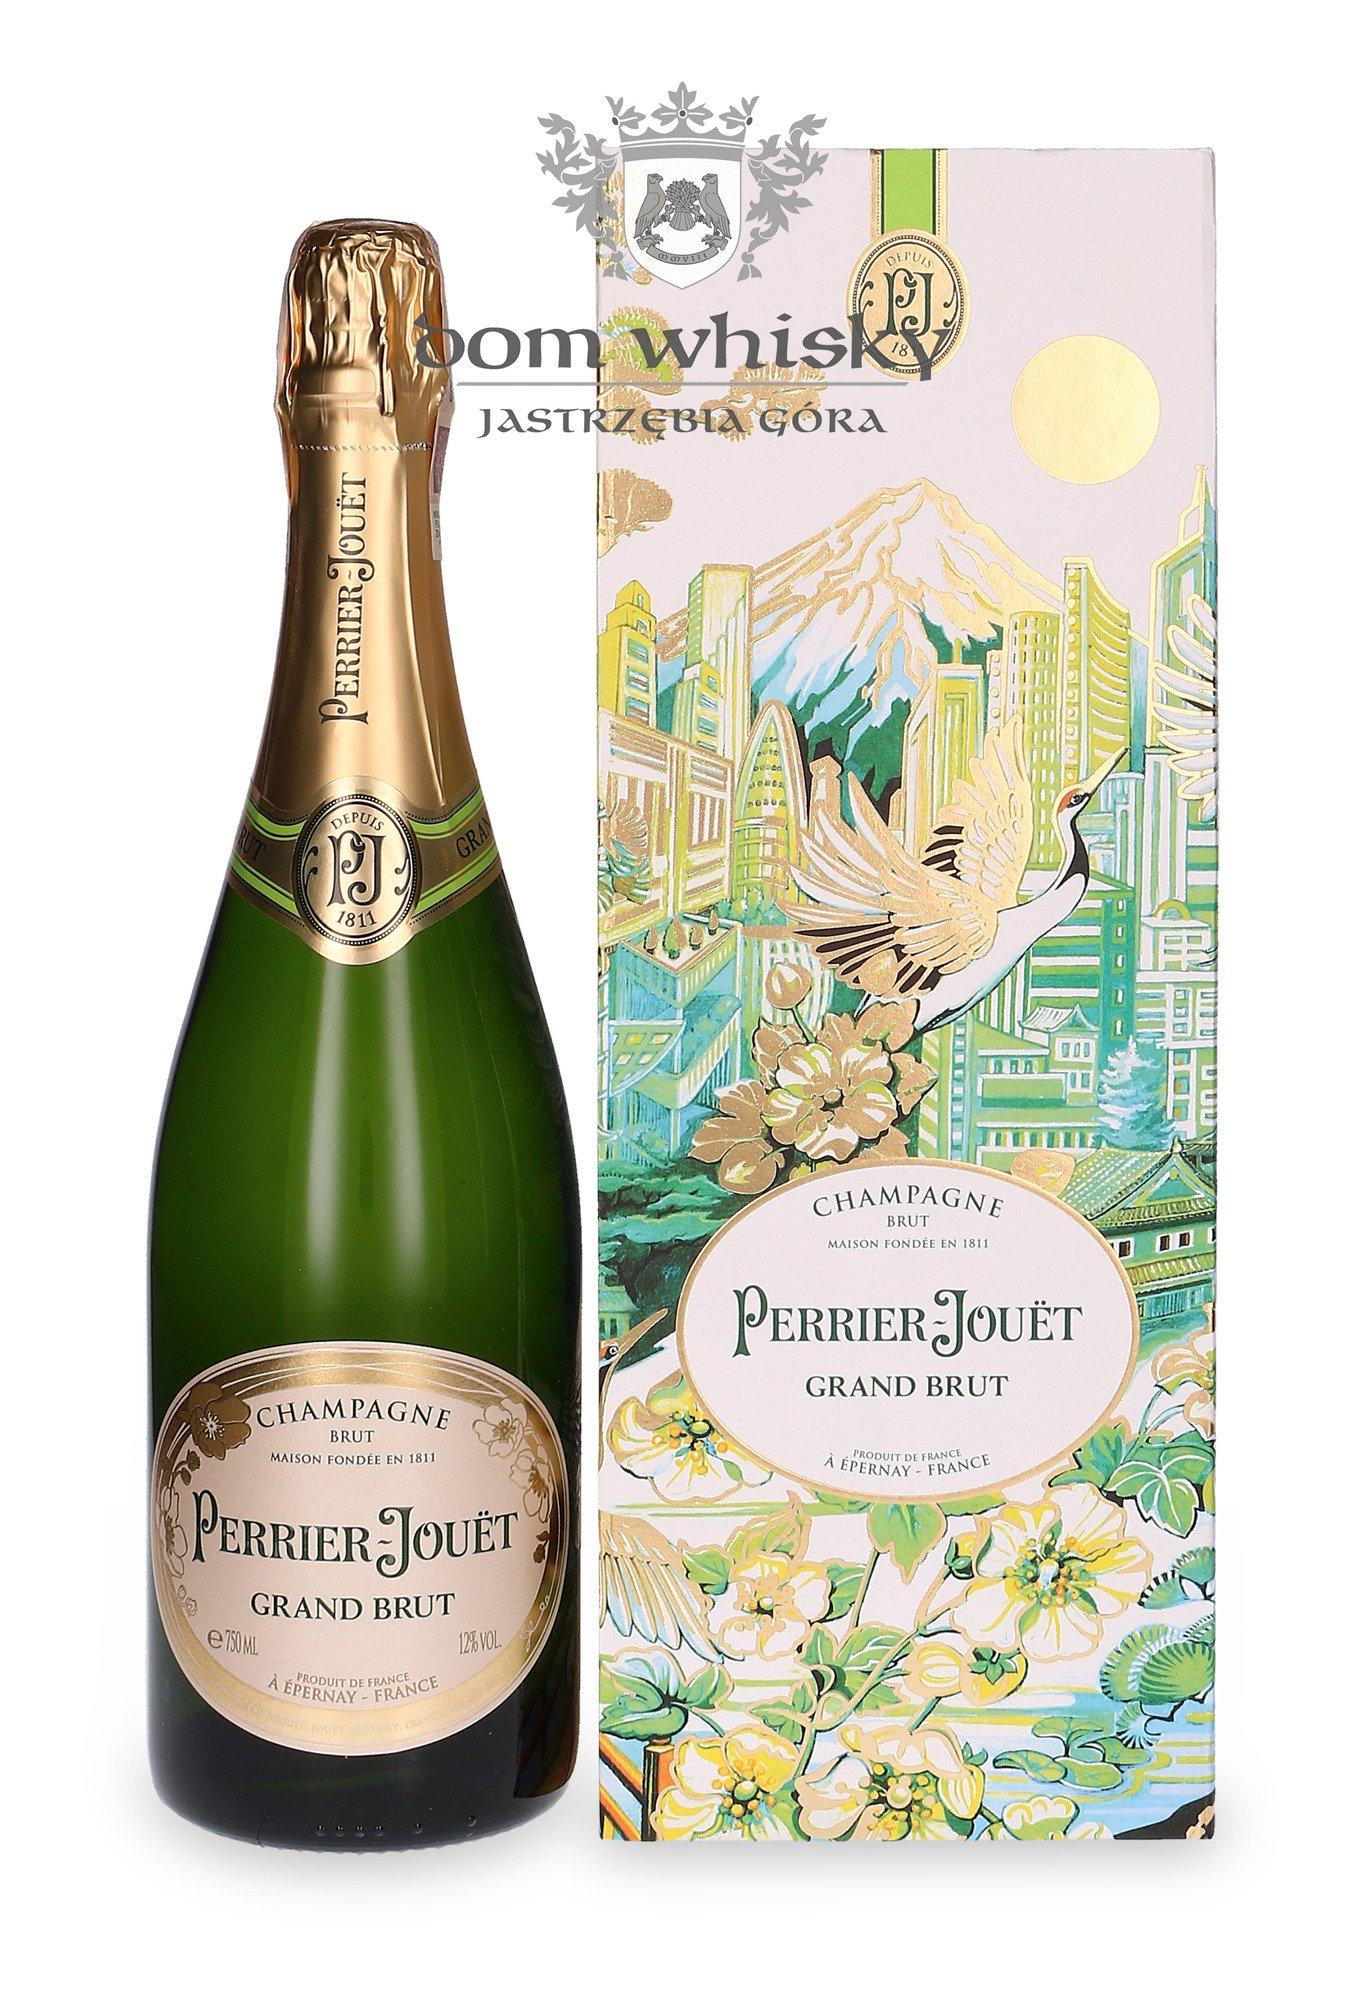 Szampan Perrier-Jouet Grand Brut City Gift Box / 12,5% / 0